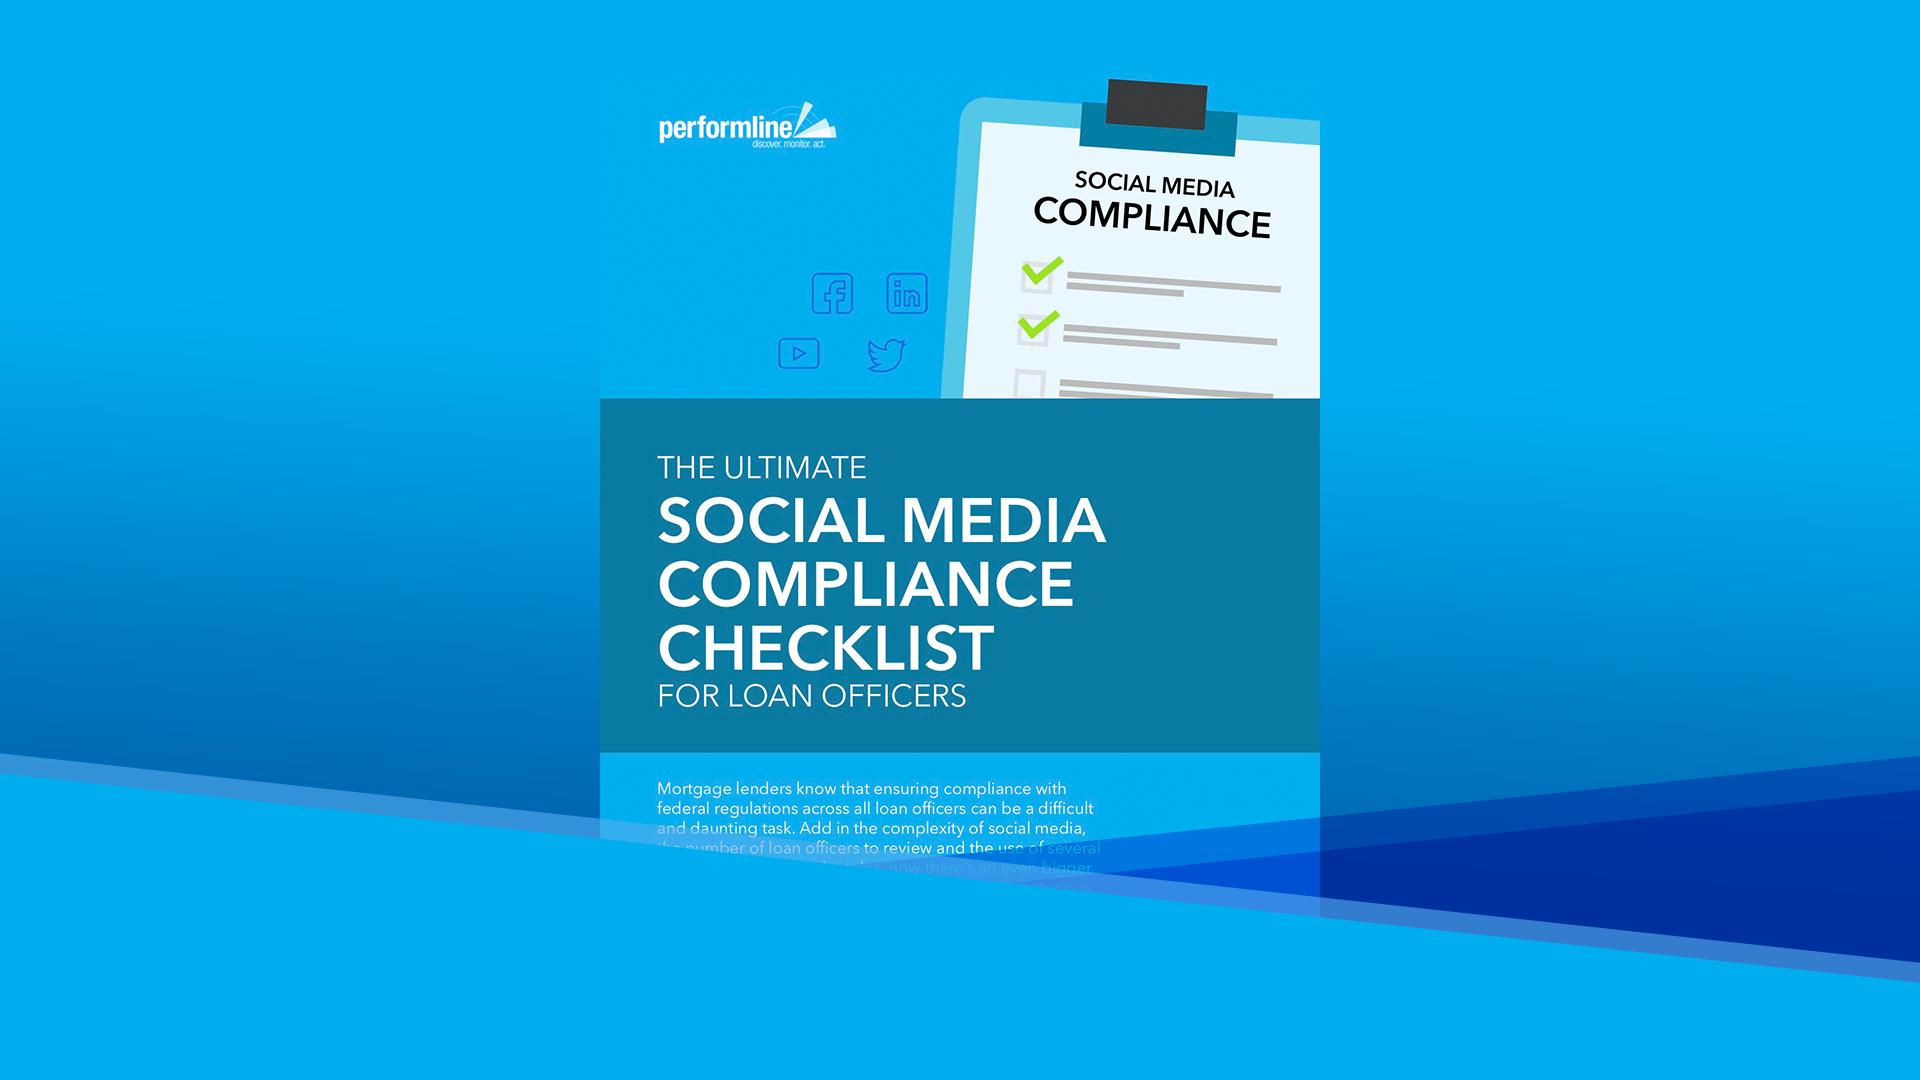 Social Media Compliance Checklist Image 1